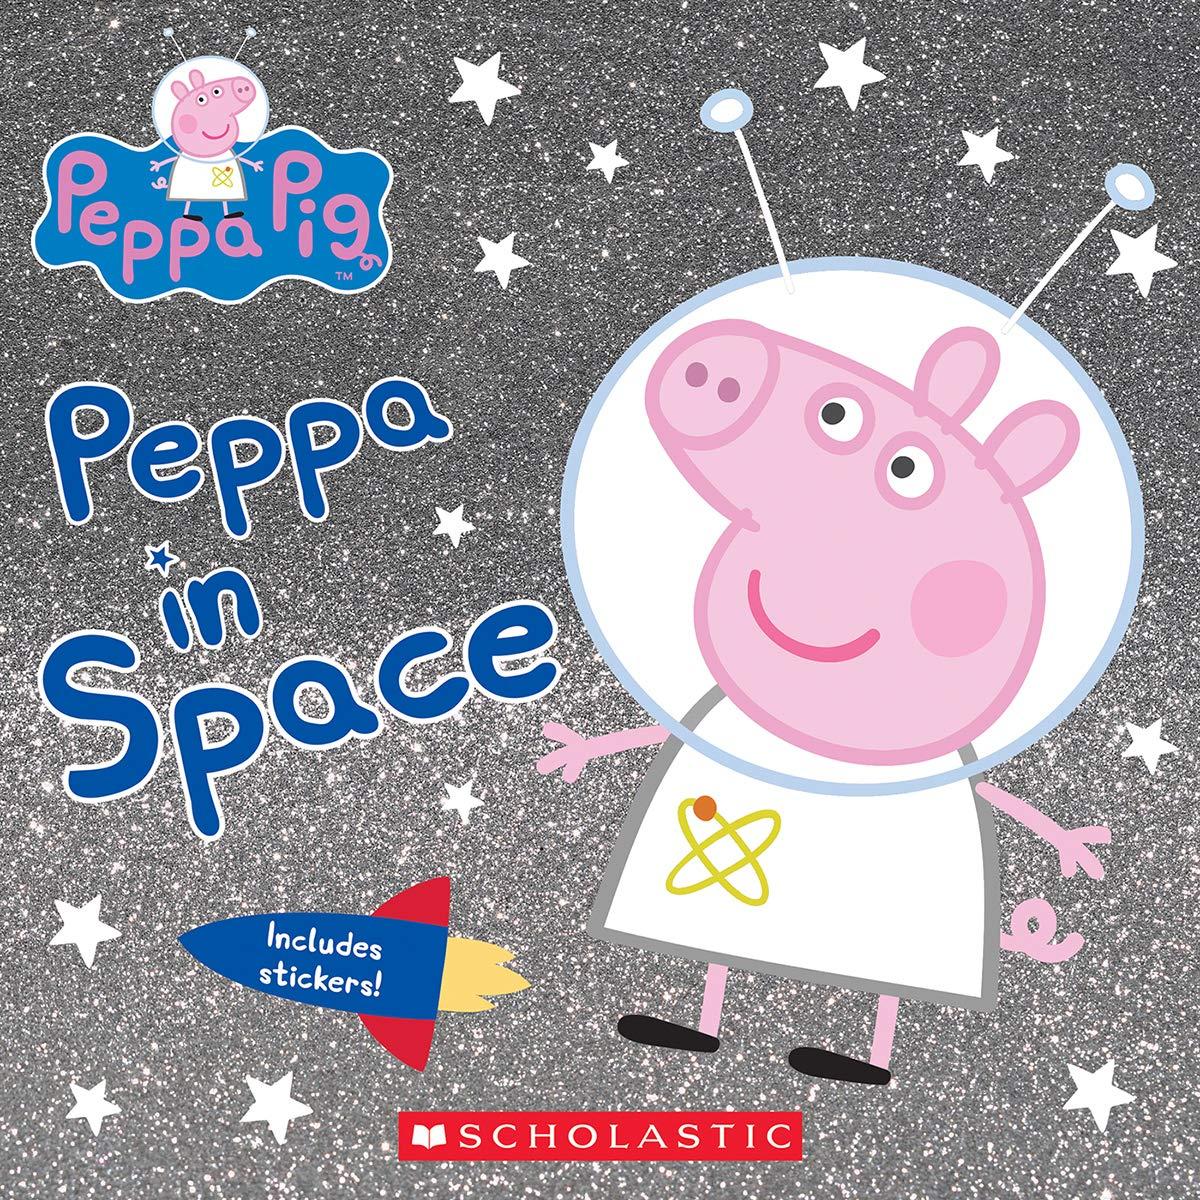 Amazon: Kids books for under $3.20